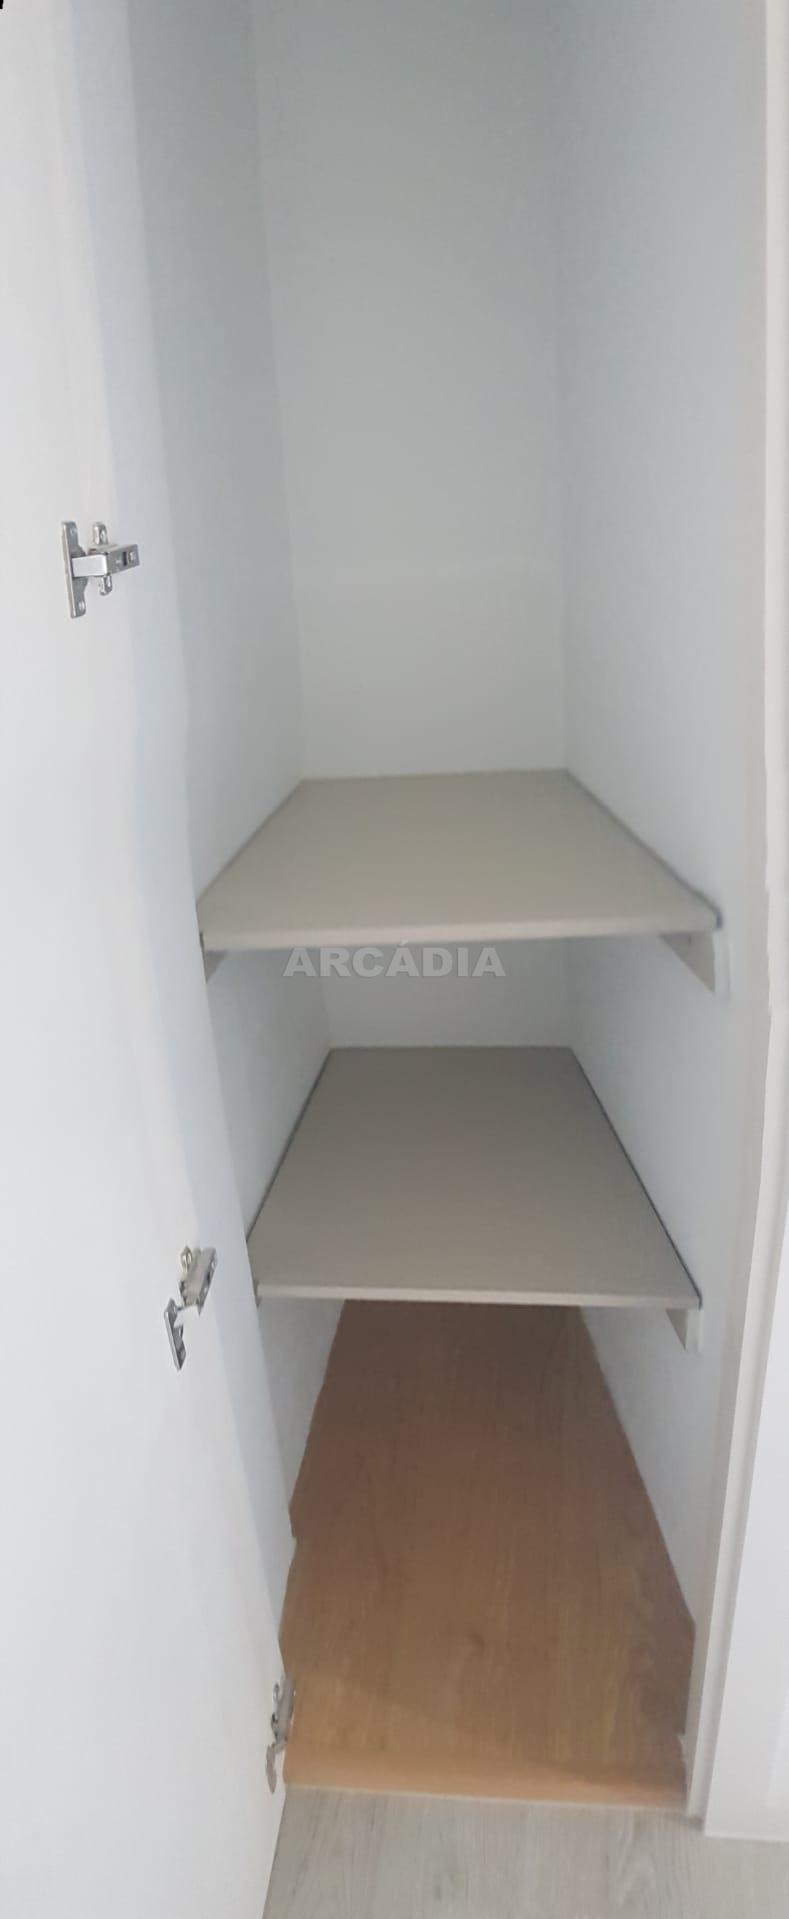 arcadia-imobiliaria-braga-apartamento-tipo-3-arrendamento-sao-lazaro-remodelado-excelente-preco-unica-oportunidade6